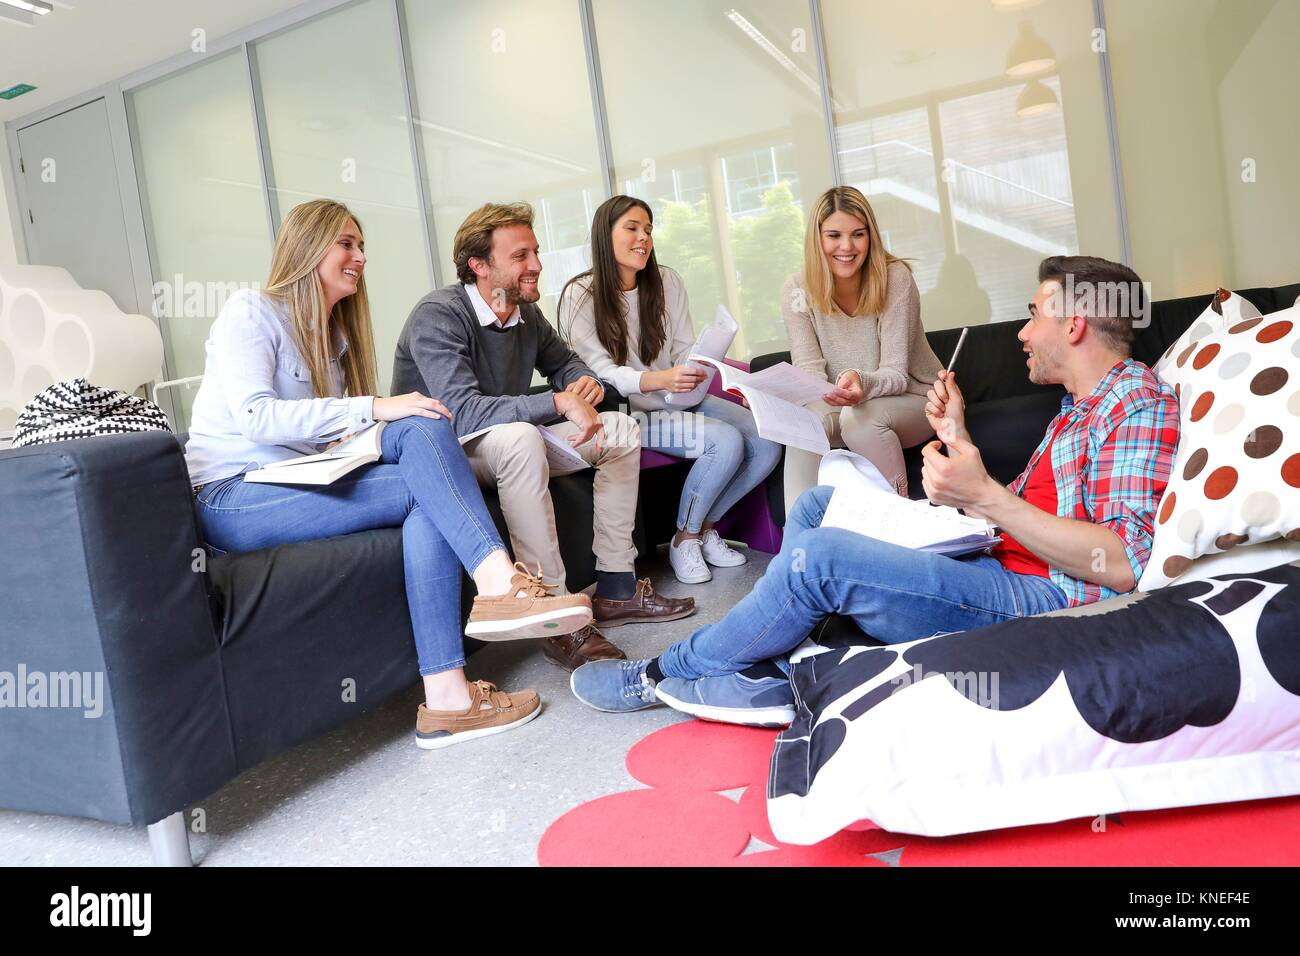 Group of students, Rest area, University, Donostia, San Sebastian, Basque Country, Spain - Stock Image